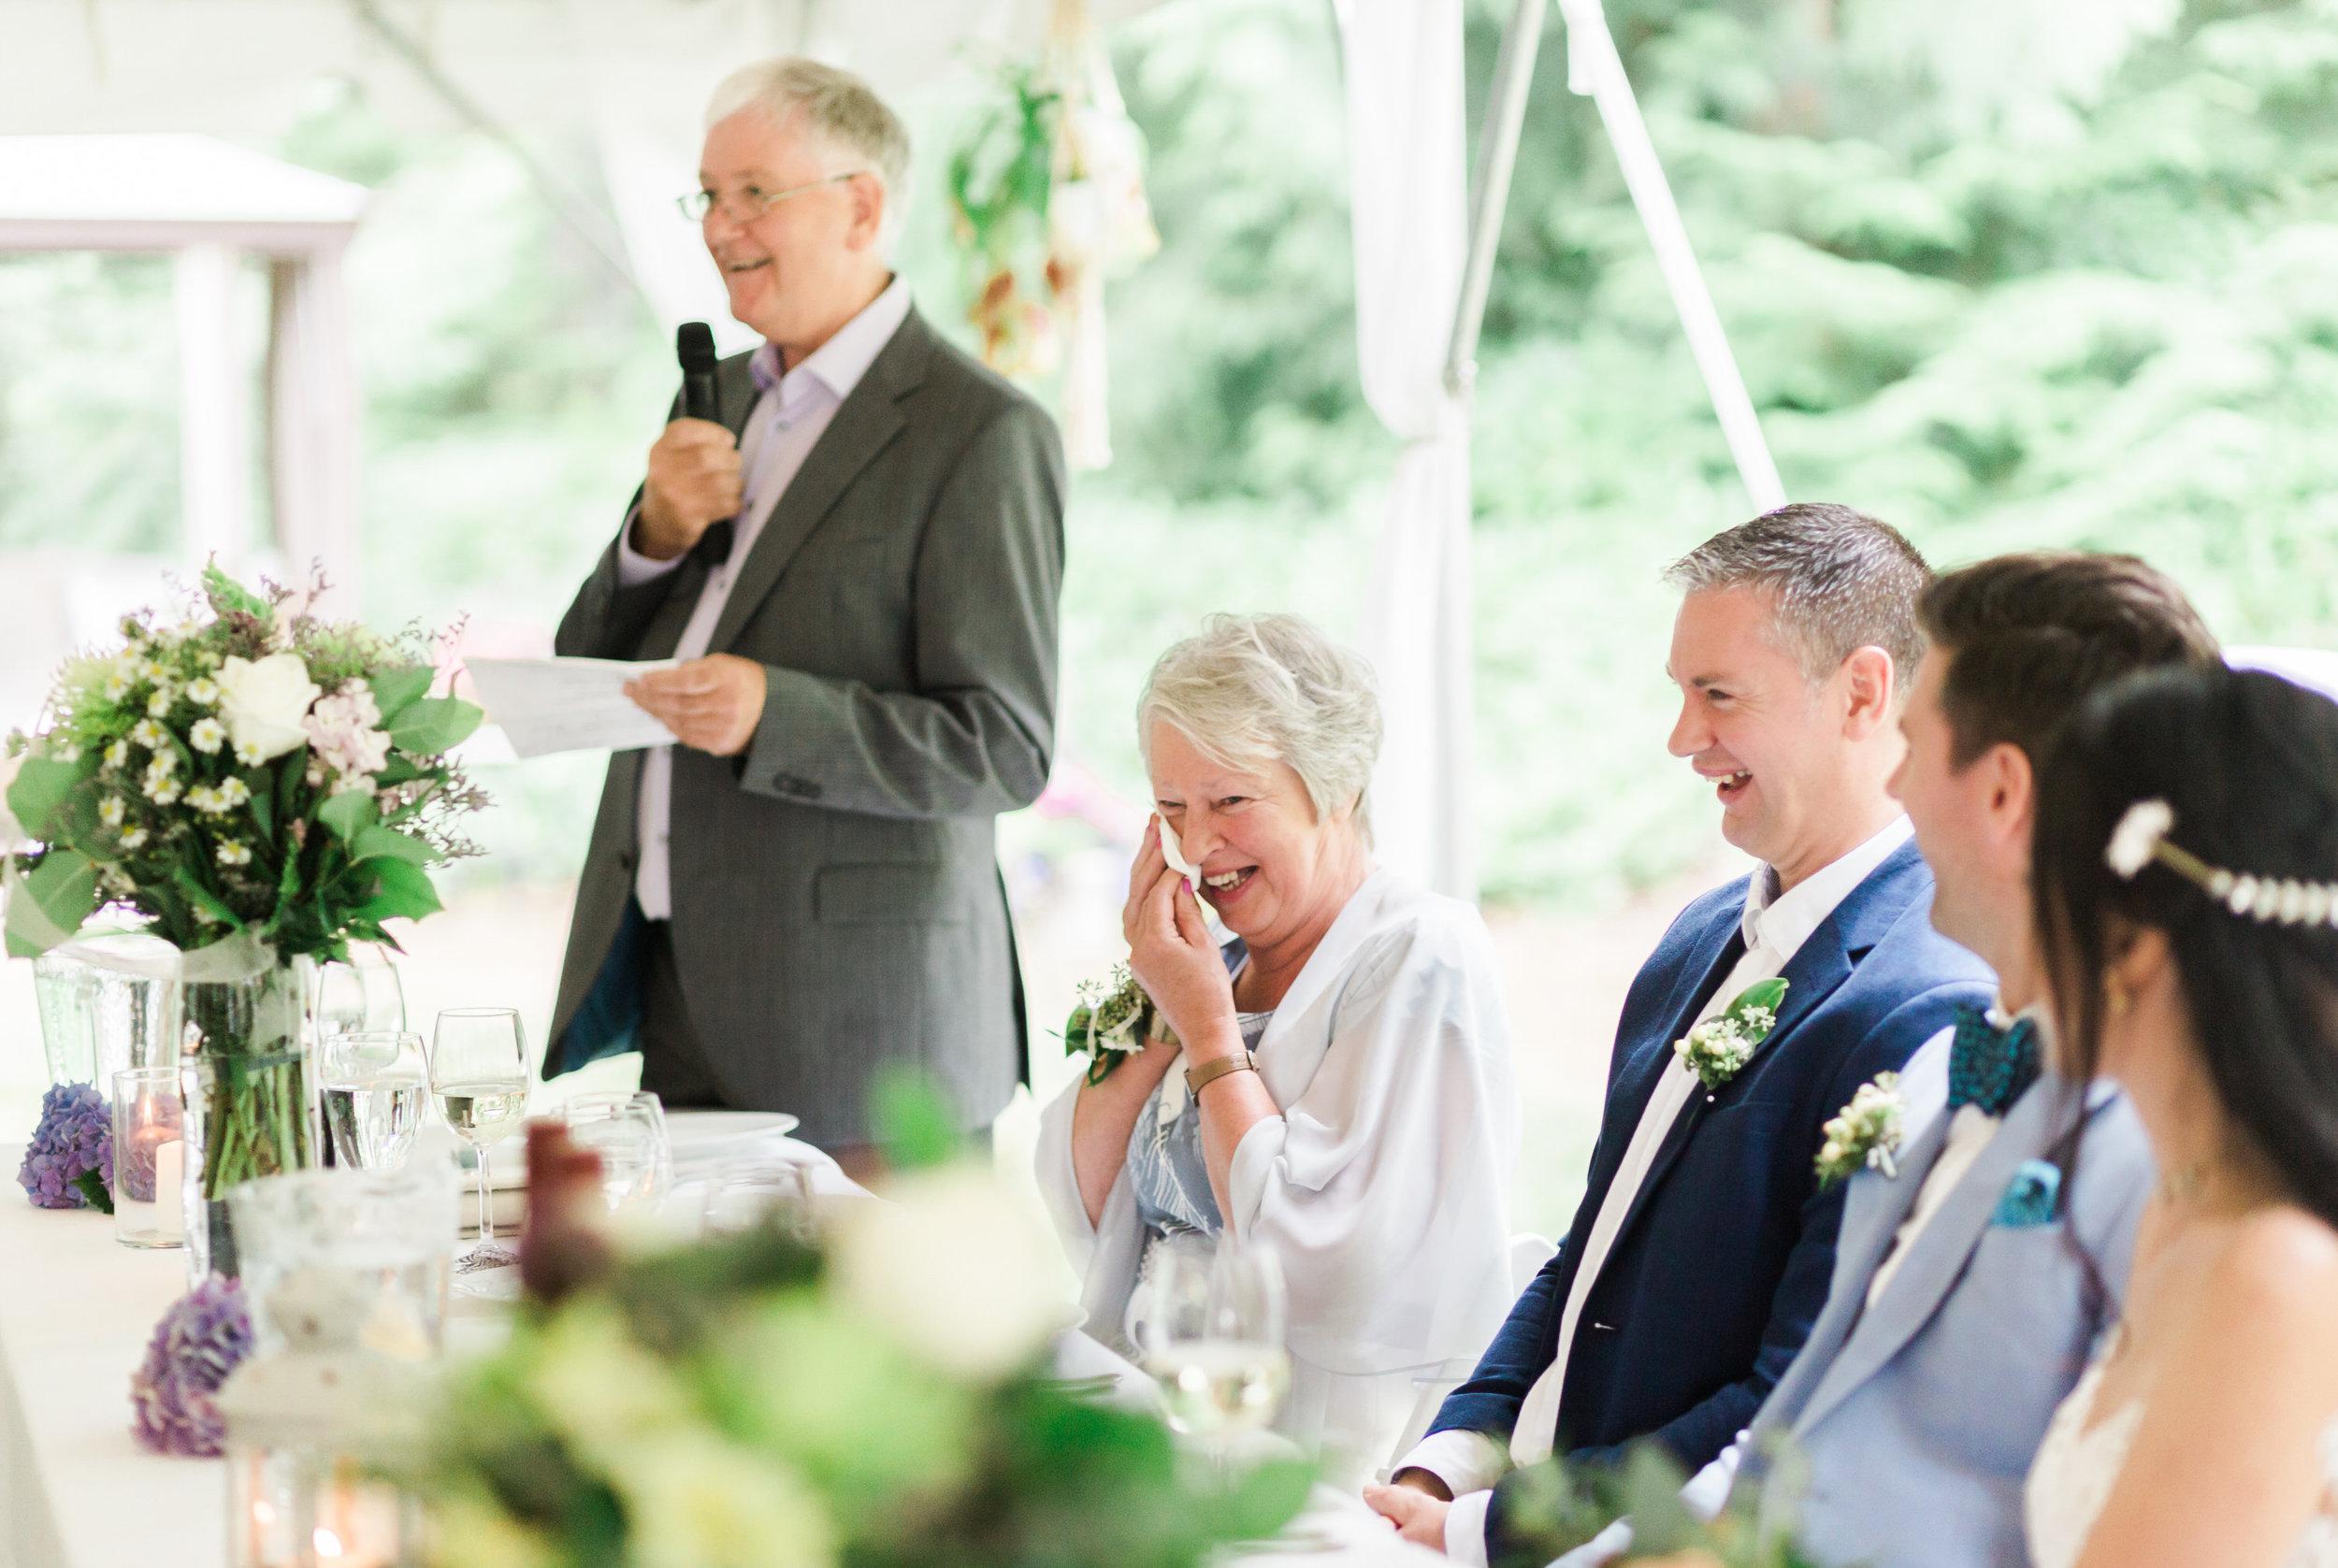 Linwood House Wedding Photos - Roberts Creek Wedding Photos - Vancouver Wedding Photographer & Videographer - Sunshine Coast Wedding Photos - Sunshine Coast Wedding Photographer - Jennifer Picard Photography - IMG_1046.jpg